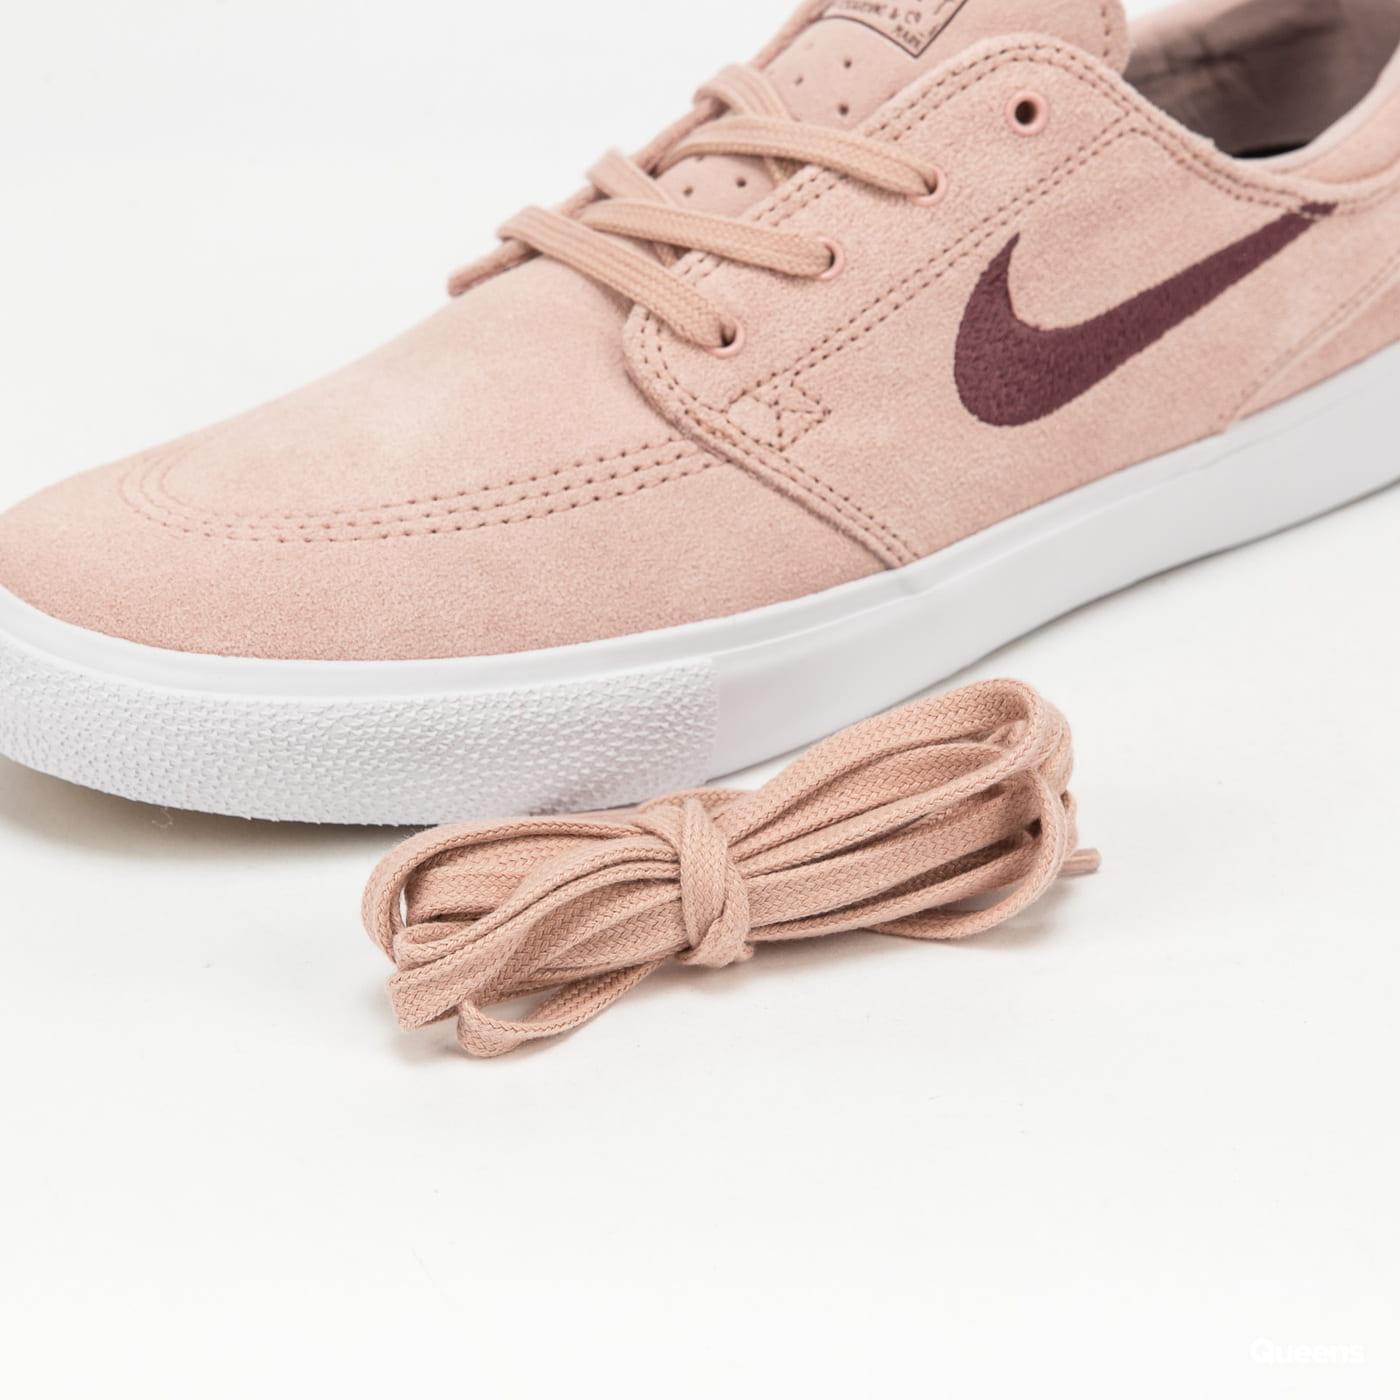 Nike SB Zoom Janoski RM pink oxford / dark wine